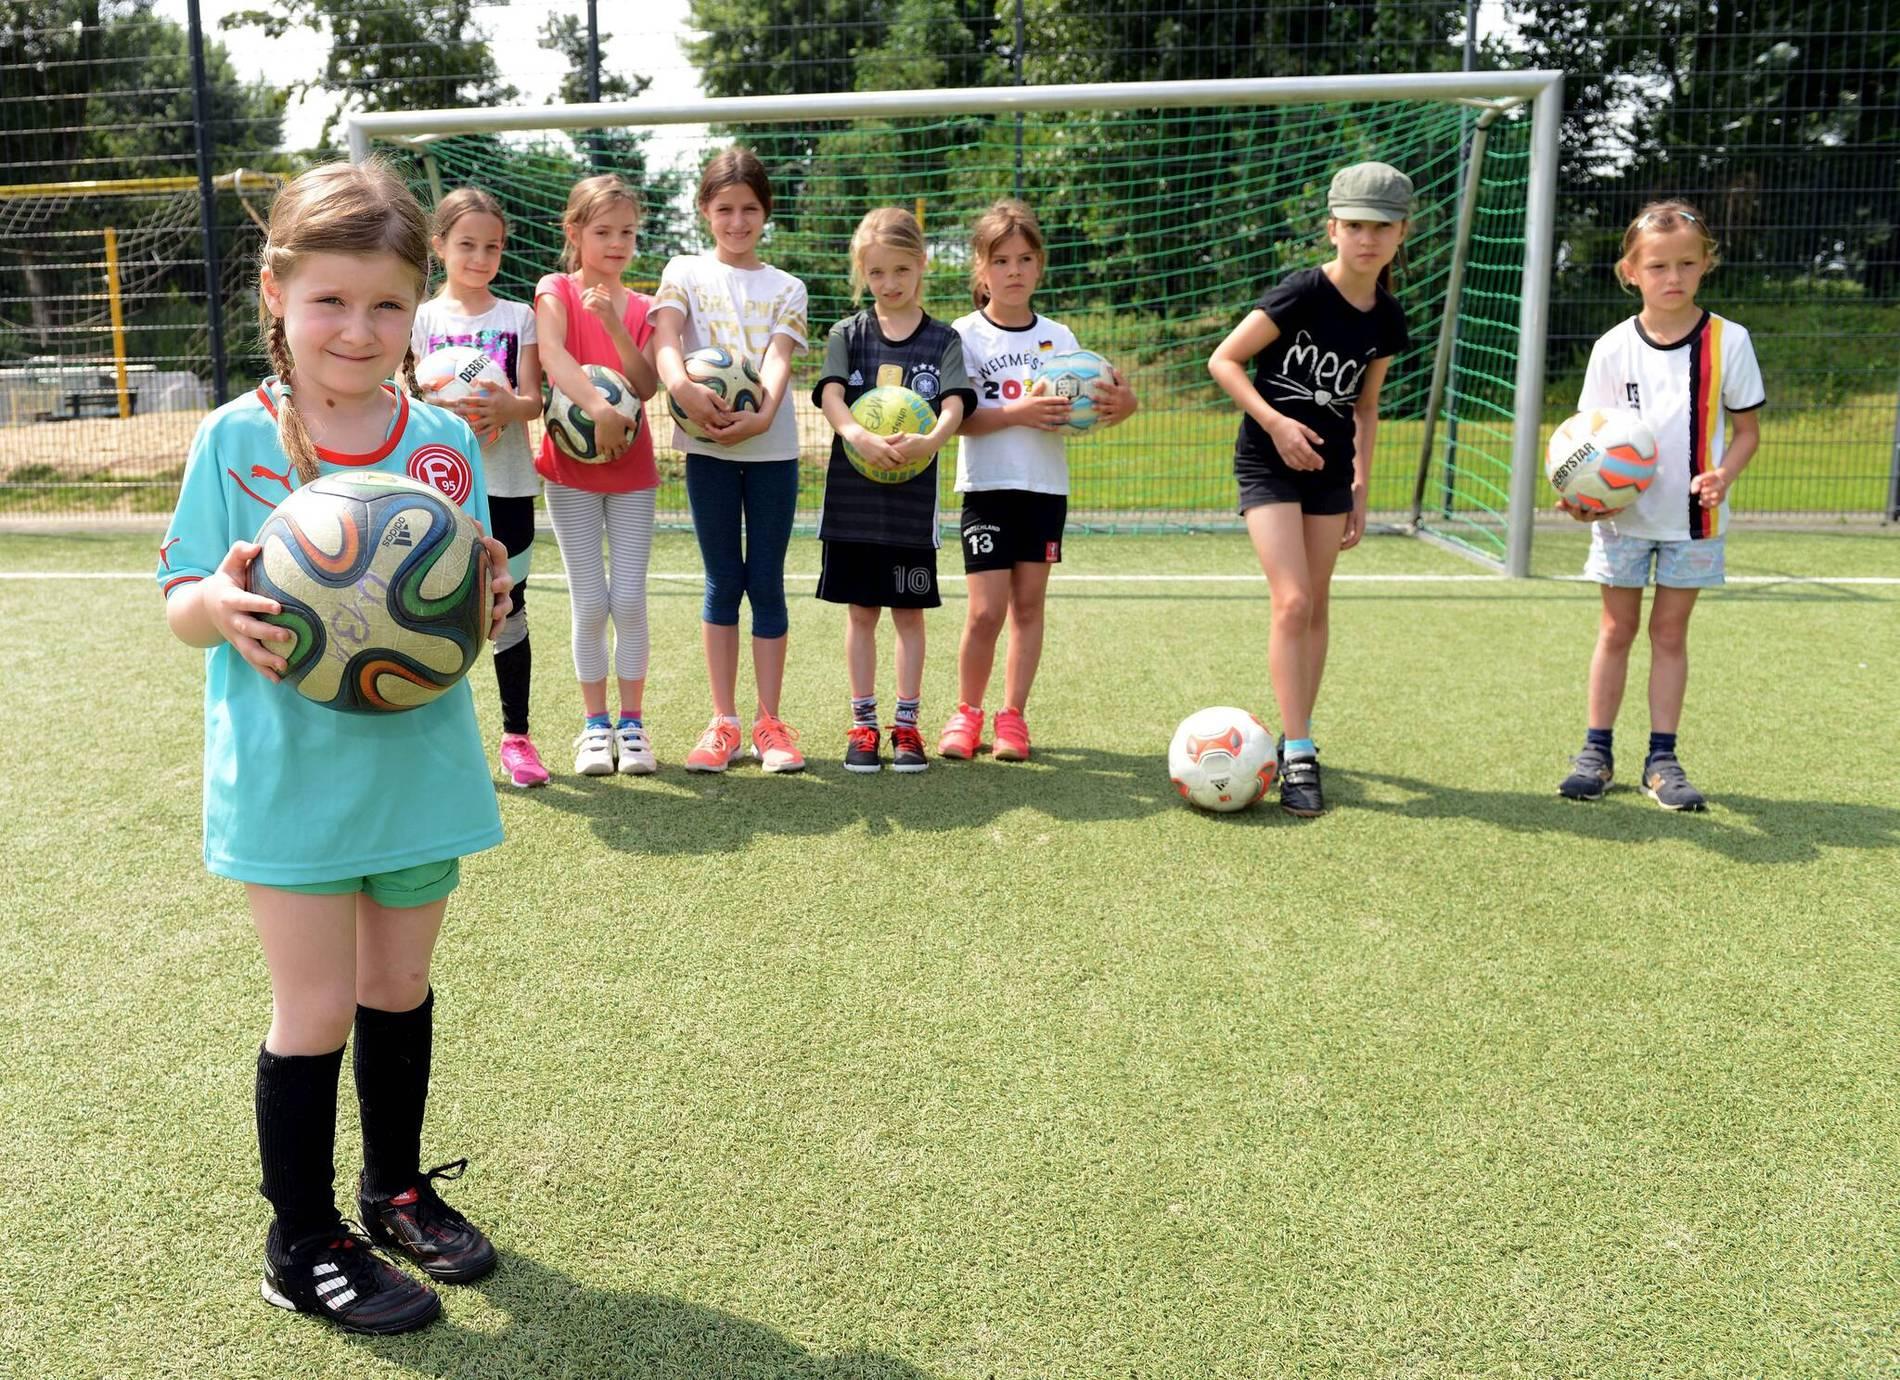 Madchen Fussball Cup Dusseldorfer Schul Turnier Wegen Hitze